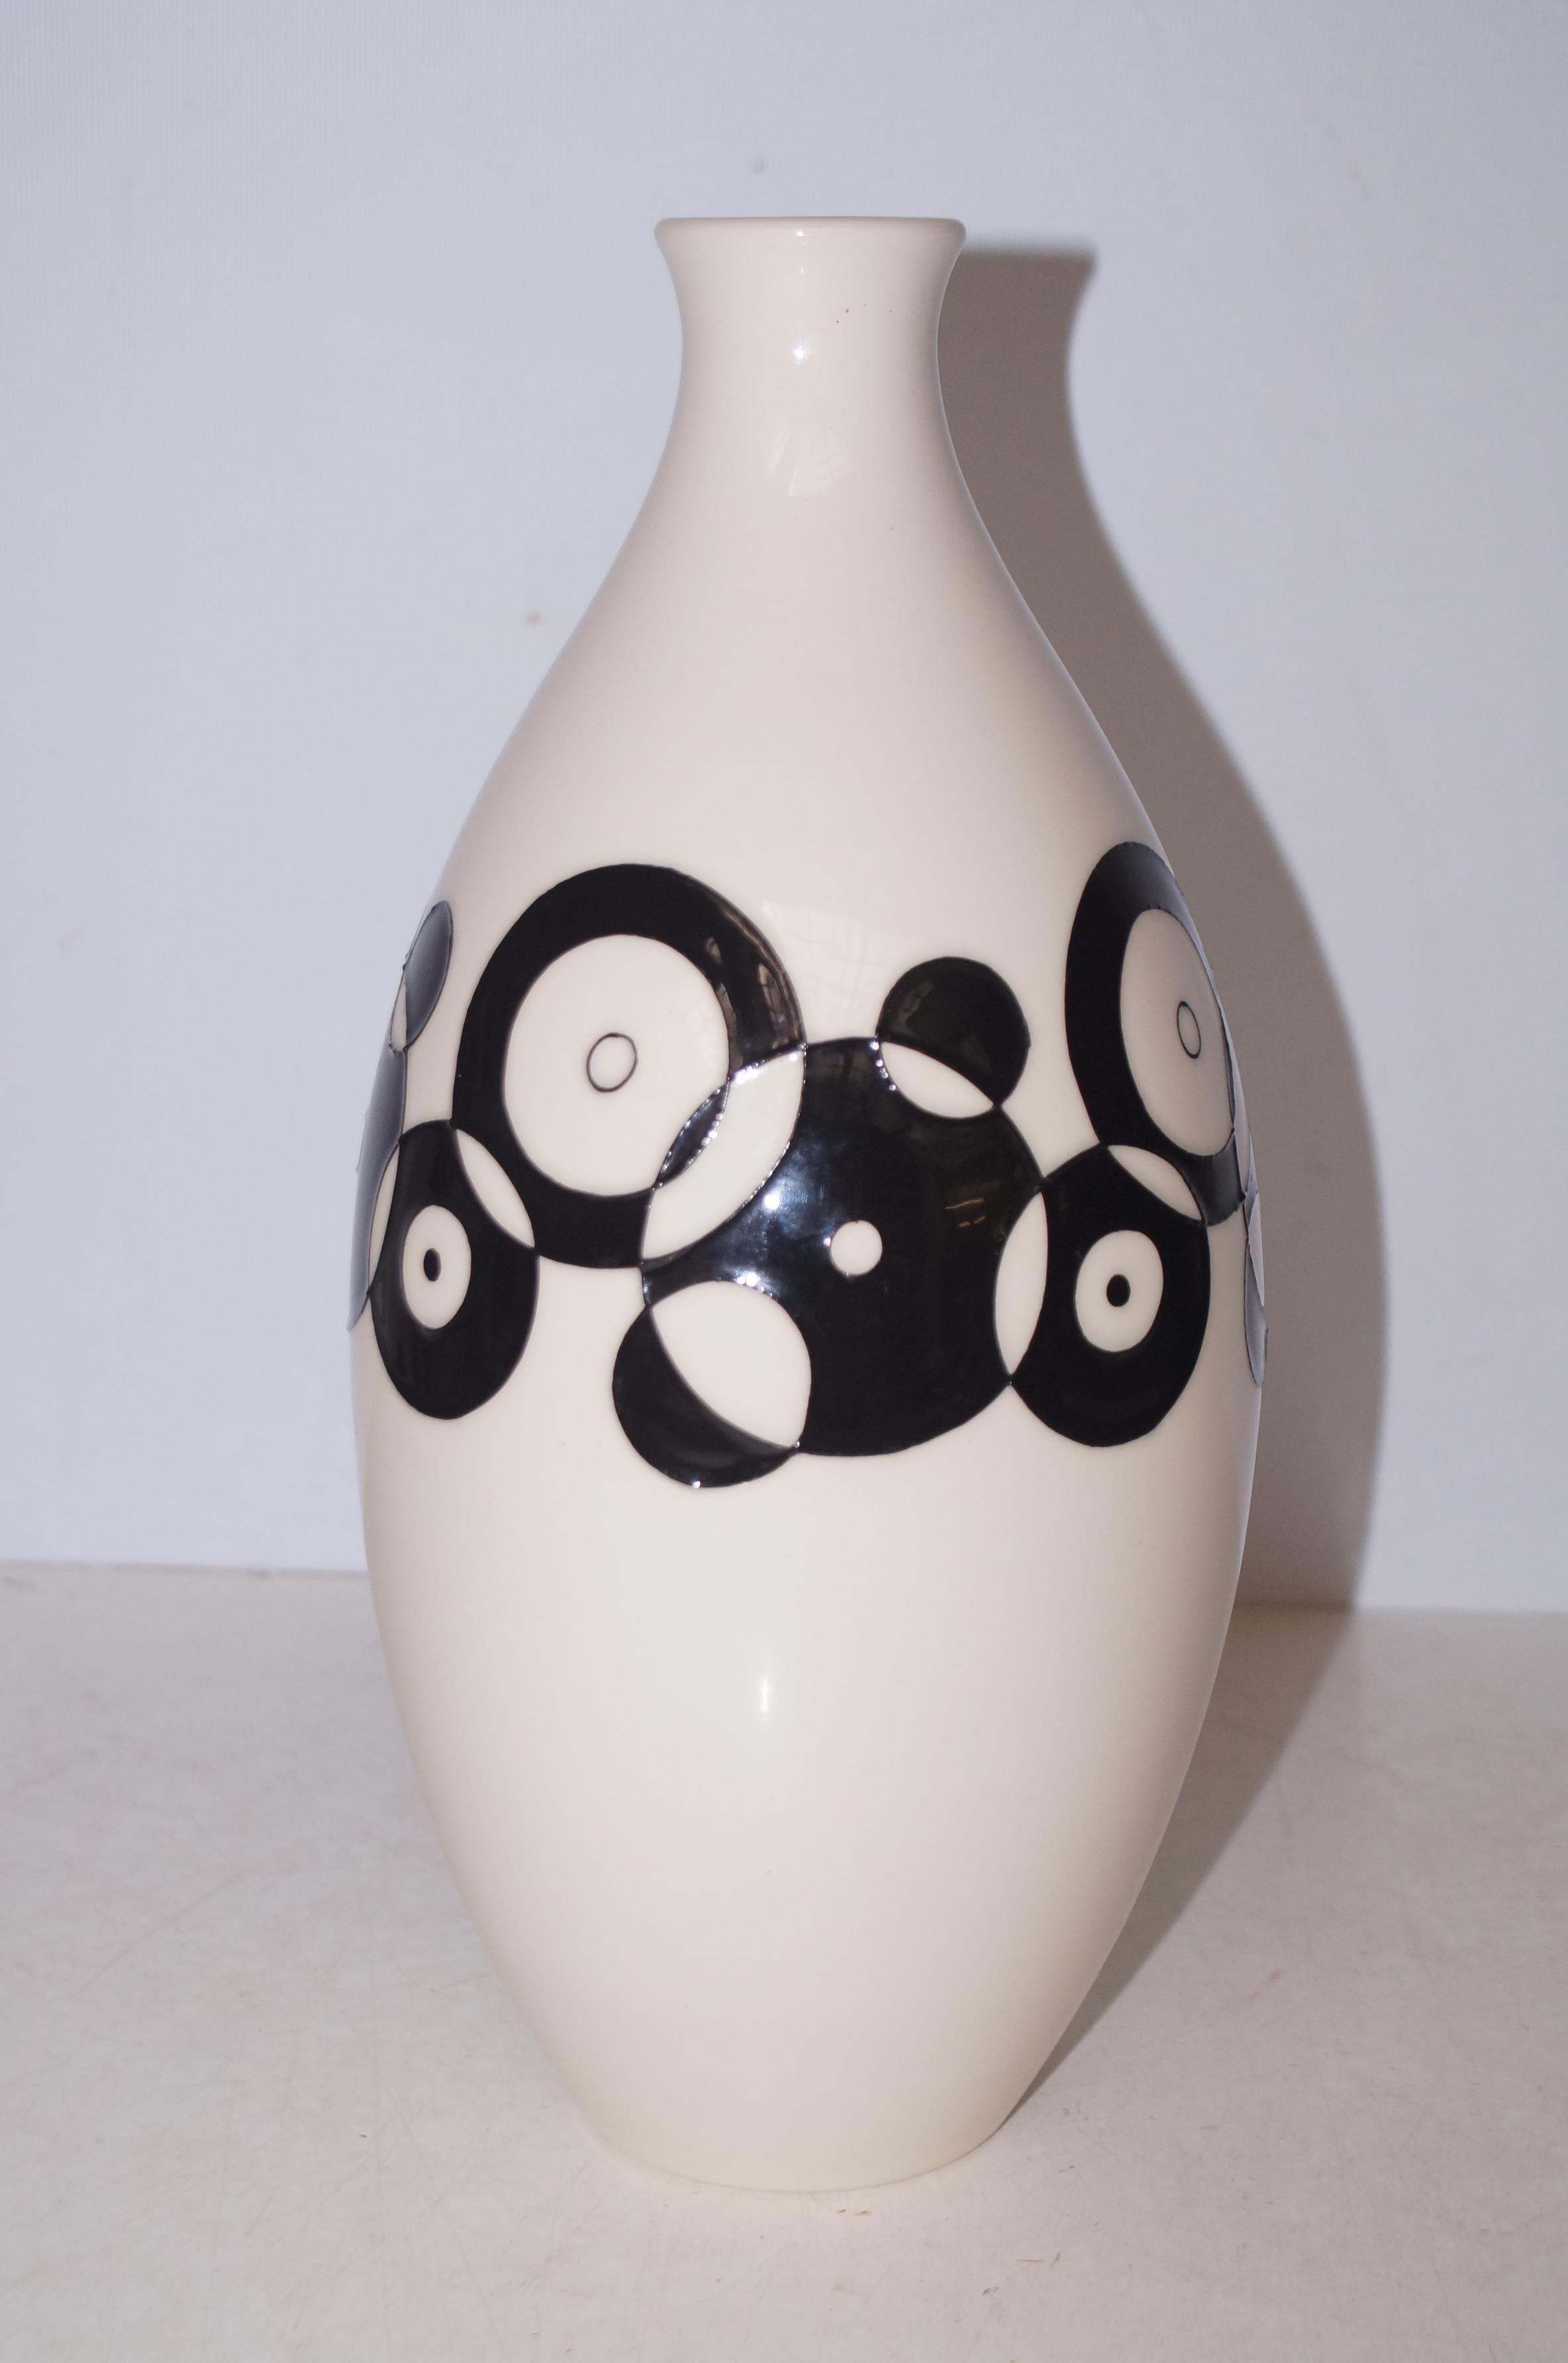 Lot 213 - Moorcroft white & black vase design trial Height 33 cm